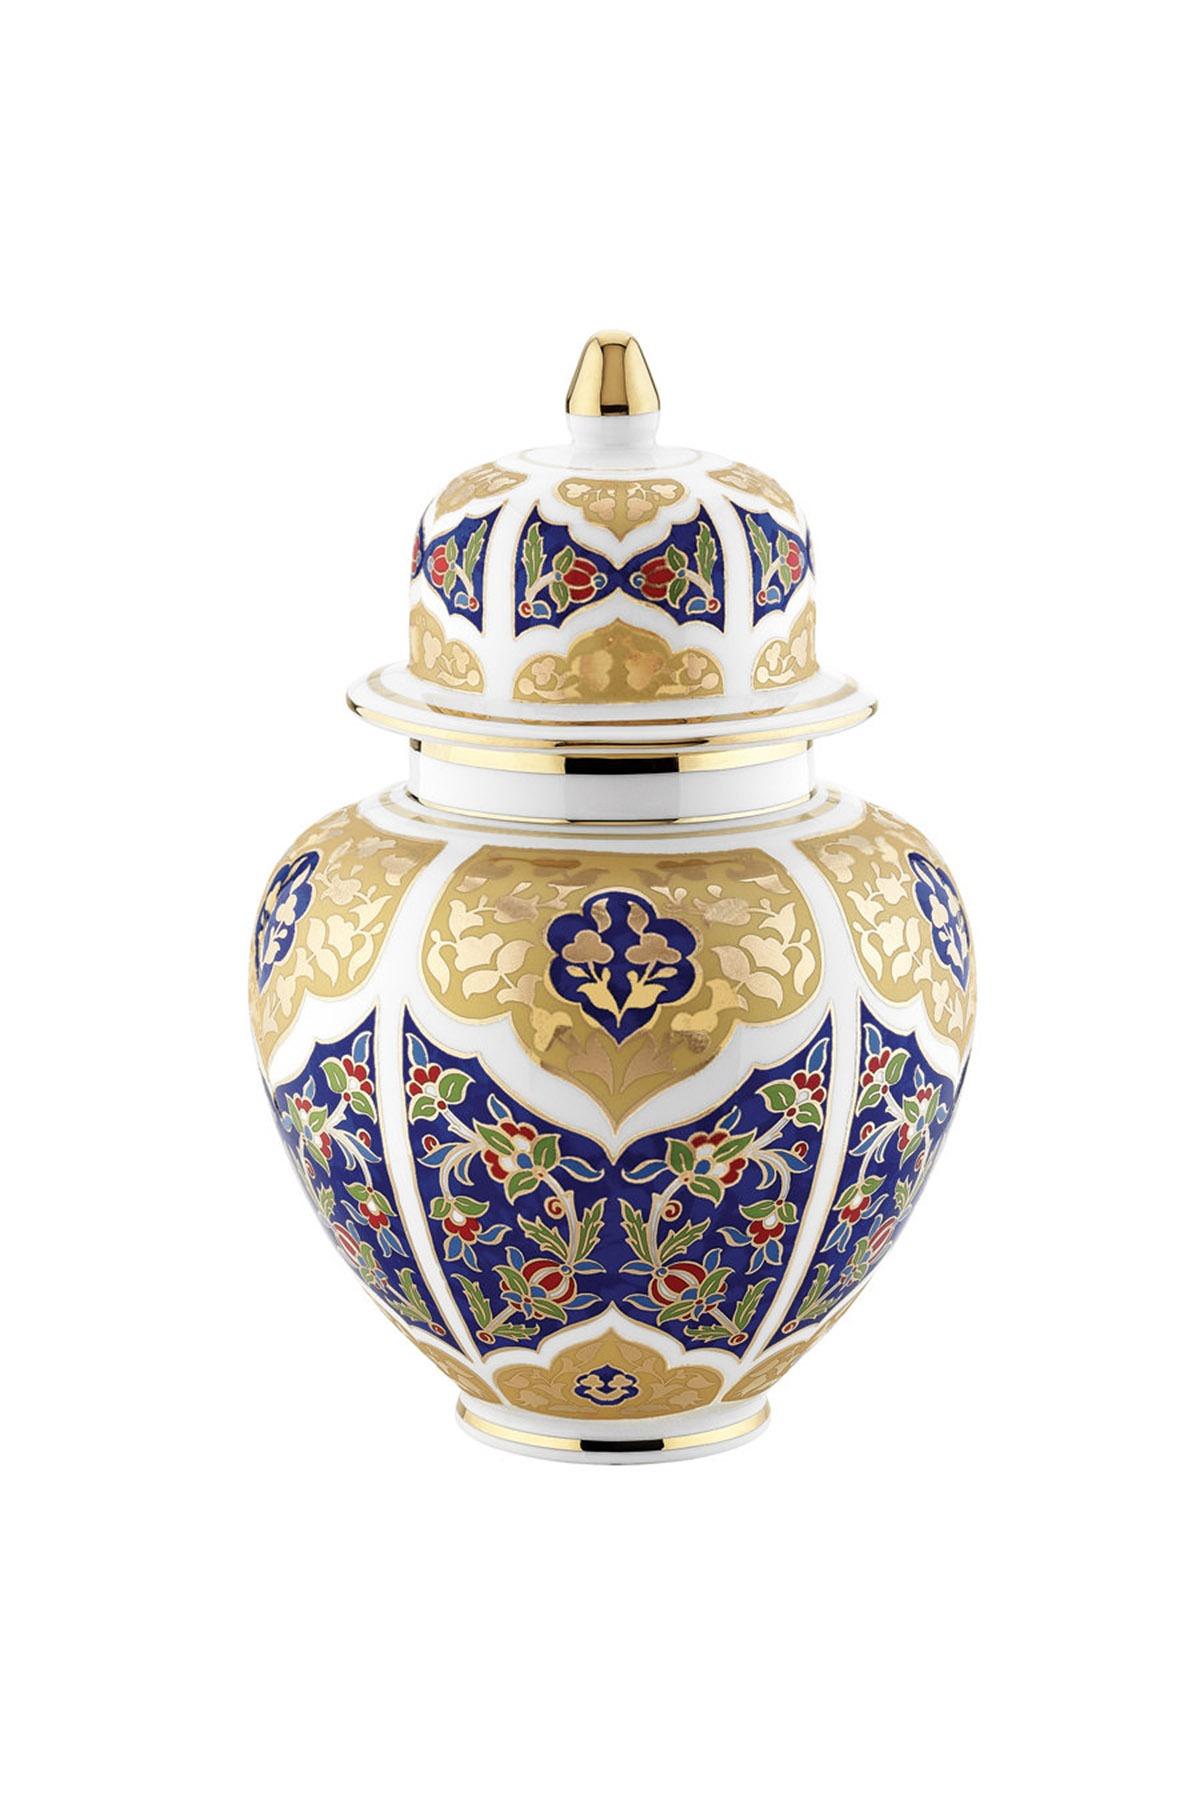 KÜTAHYA PORSELEN - Küpecik Vazo 25 Cm Dekor No:3880